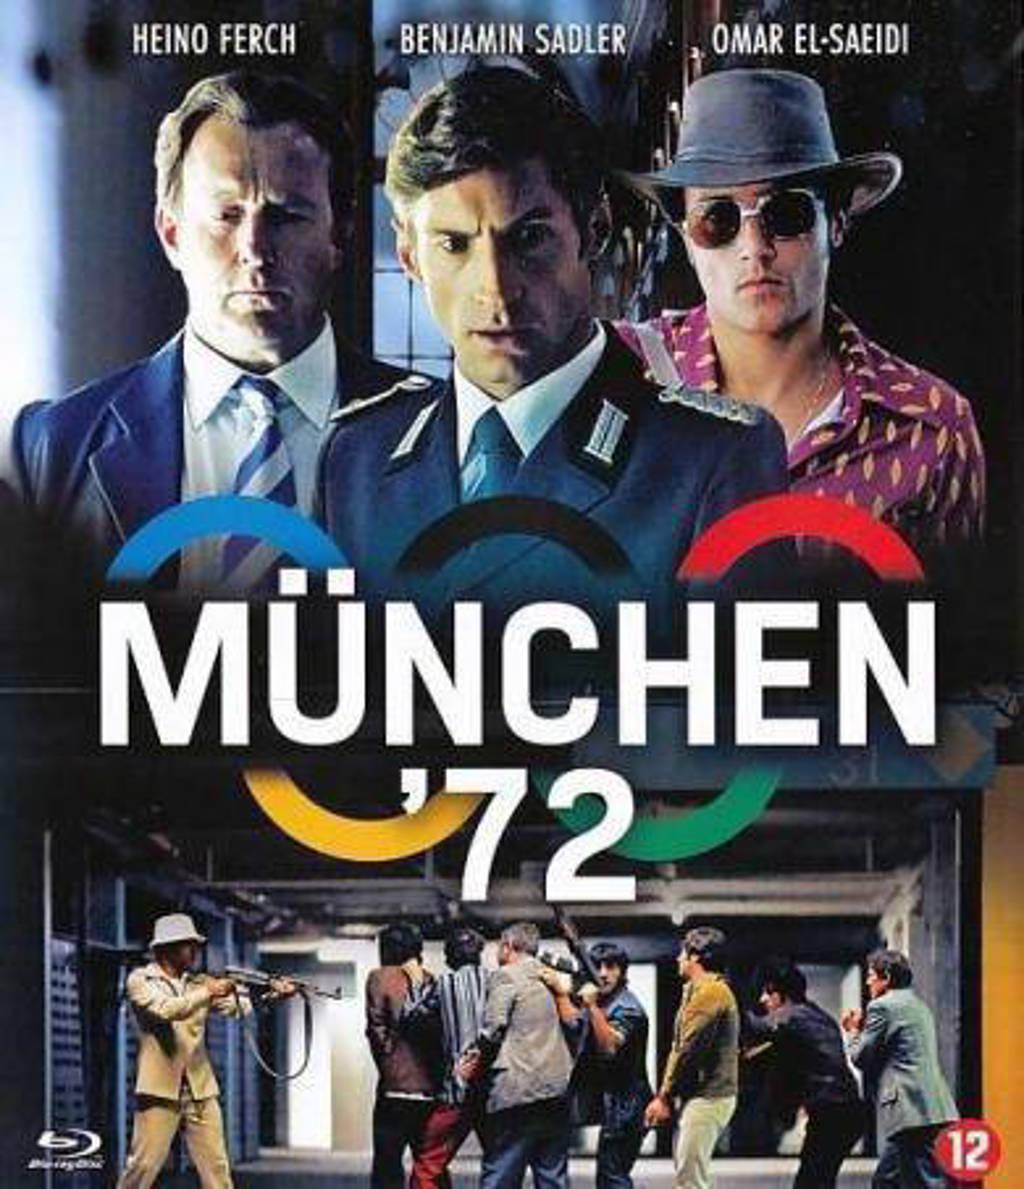 Munchen 72 (Blu-ray)